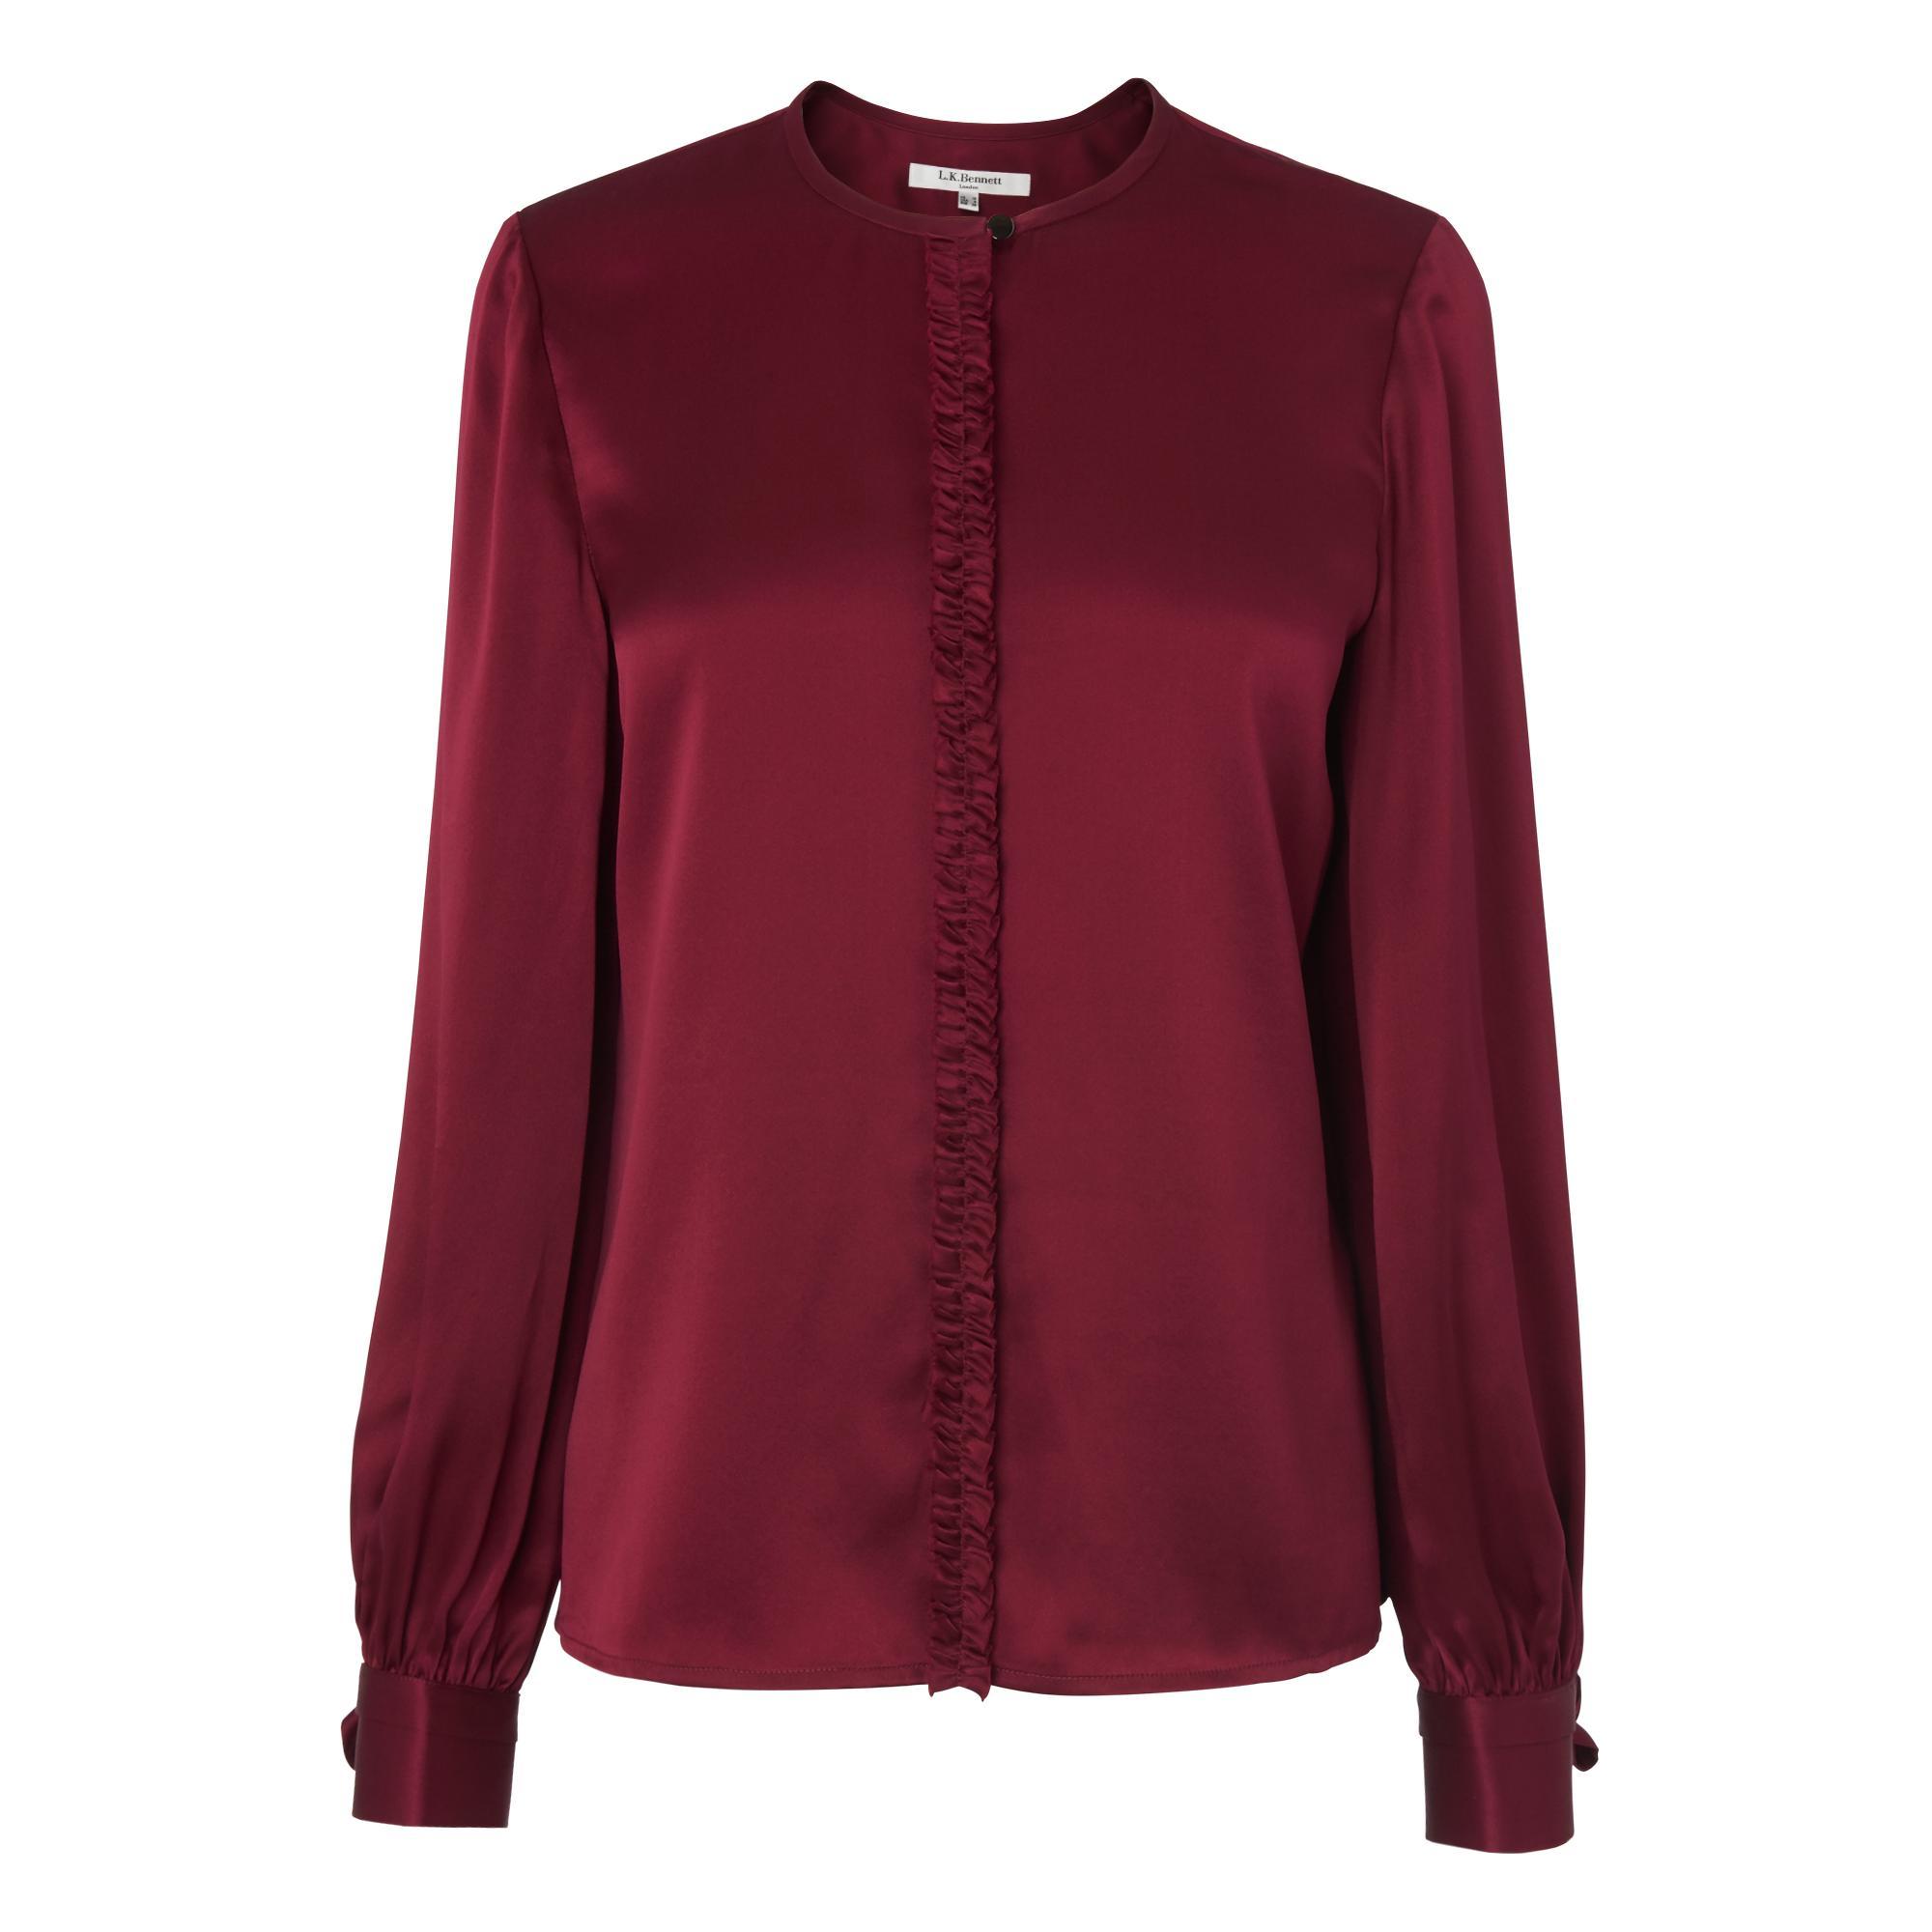 eaecb39138353 Aalia Red Silk Top